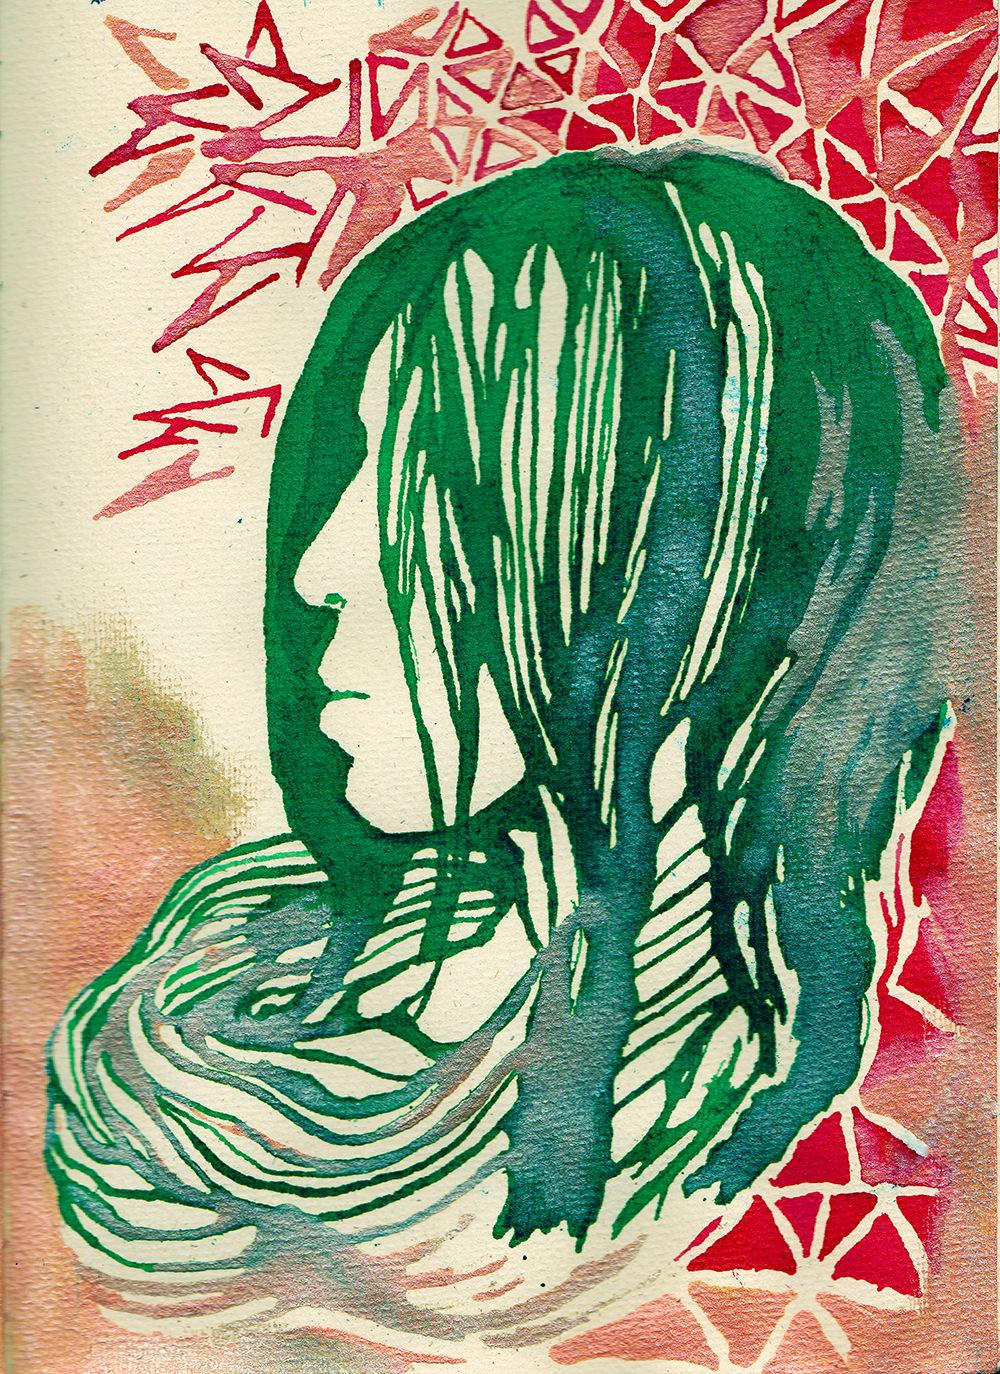 Sketchbook of Jenie Gao - watercolor